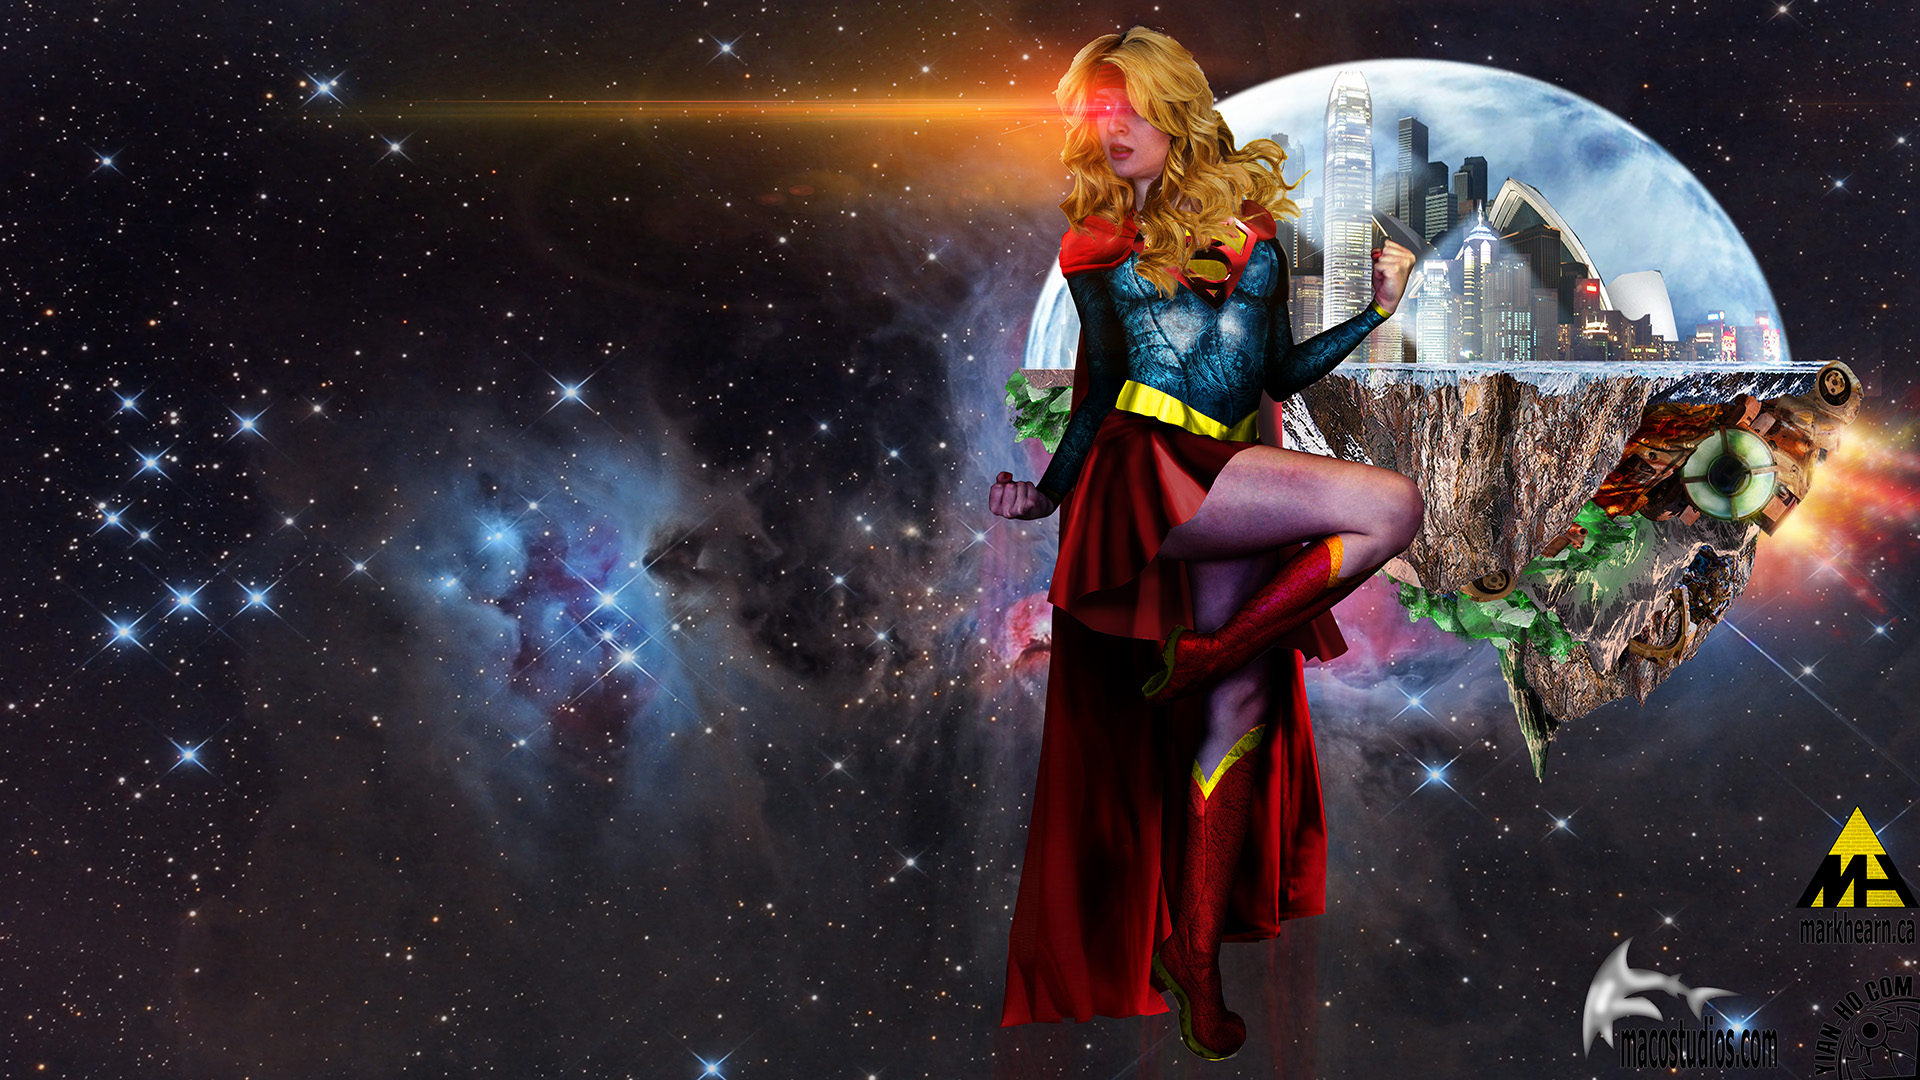 Pics Photos   Supergirl Wallpapers Superhero Wallpapers 1920x1080